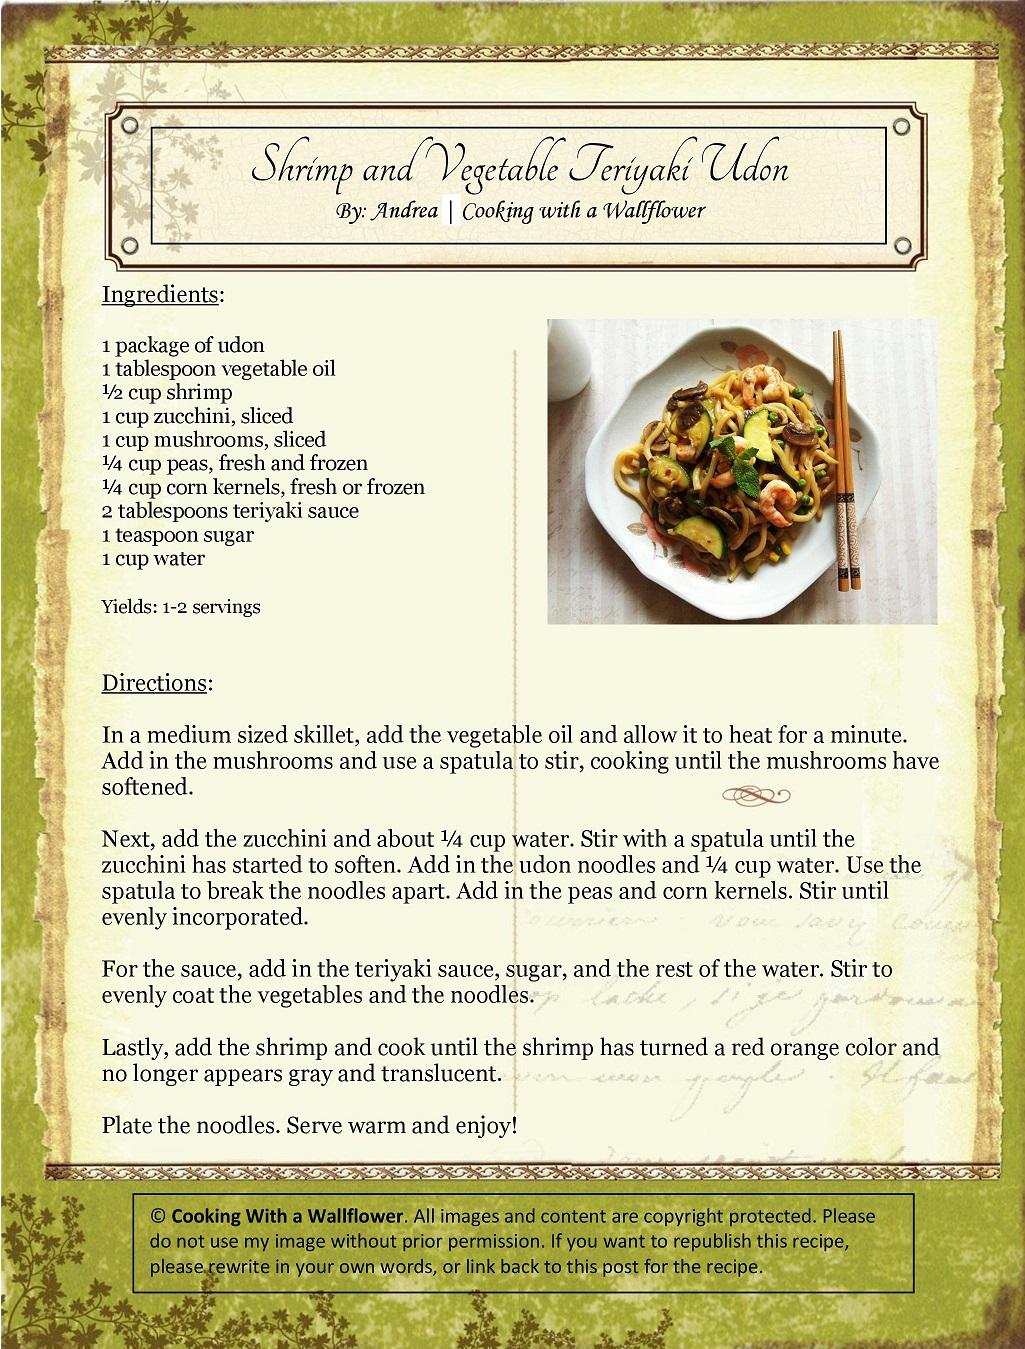 Shrimp and Vegetable Teriyaki Udon Recipe Card